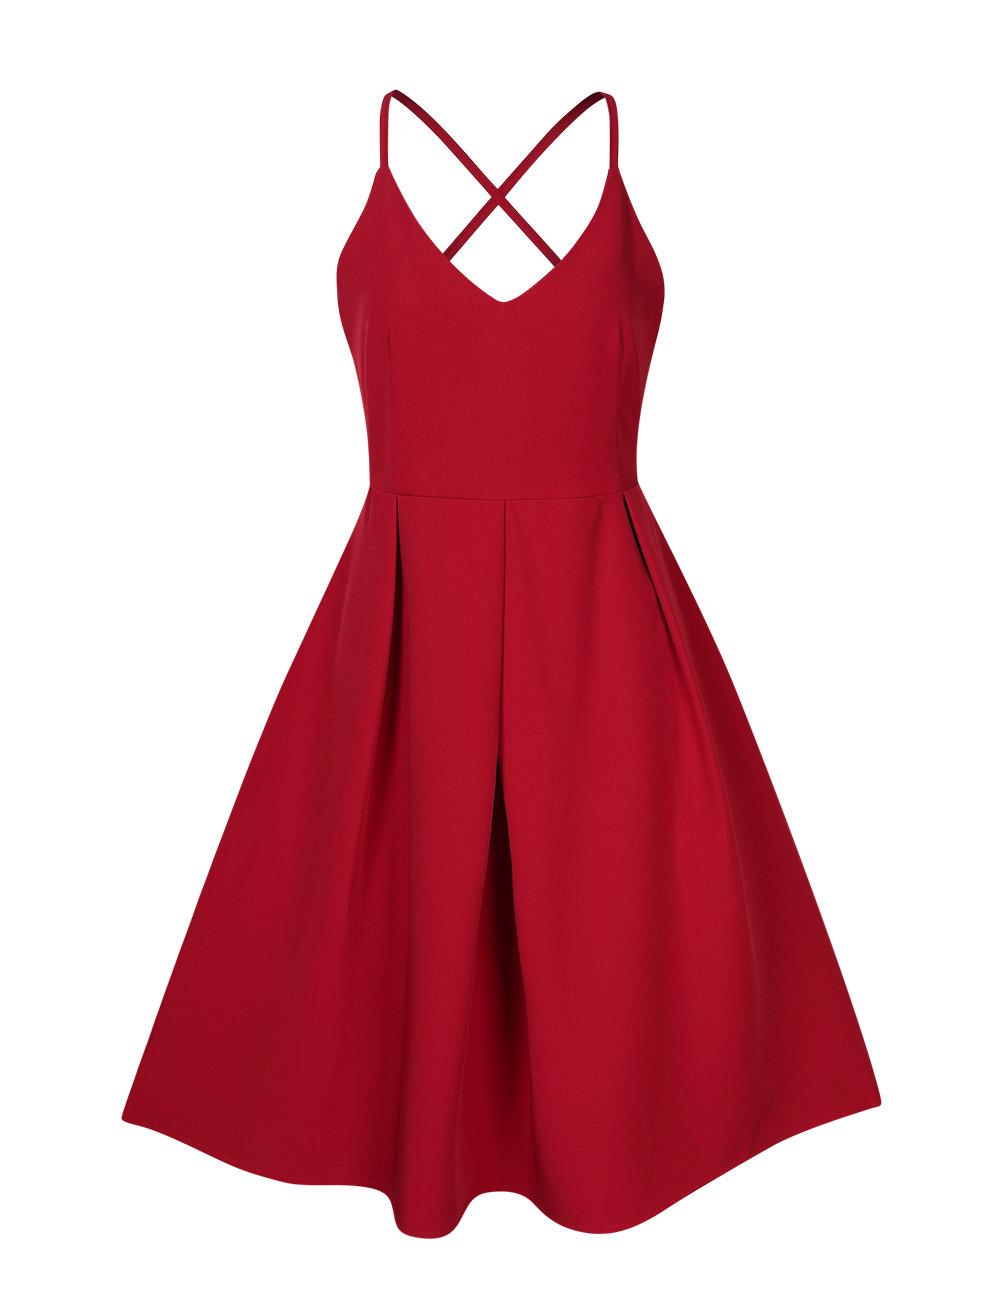 GlorySunshine Women Deep V-Neck Spaghetti Strap Dress Sleeveless Sexy Summer Cocktail Party Dresses Red_M